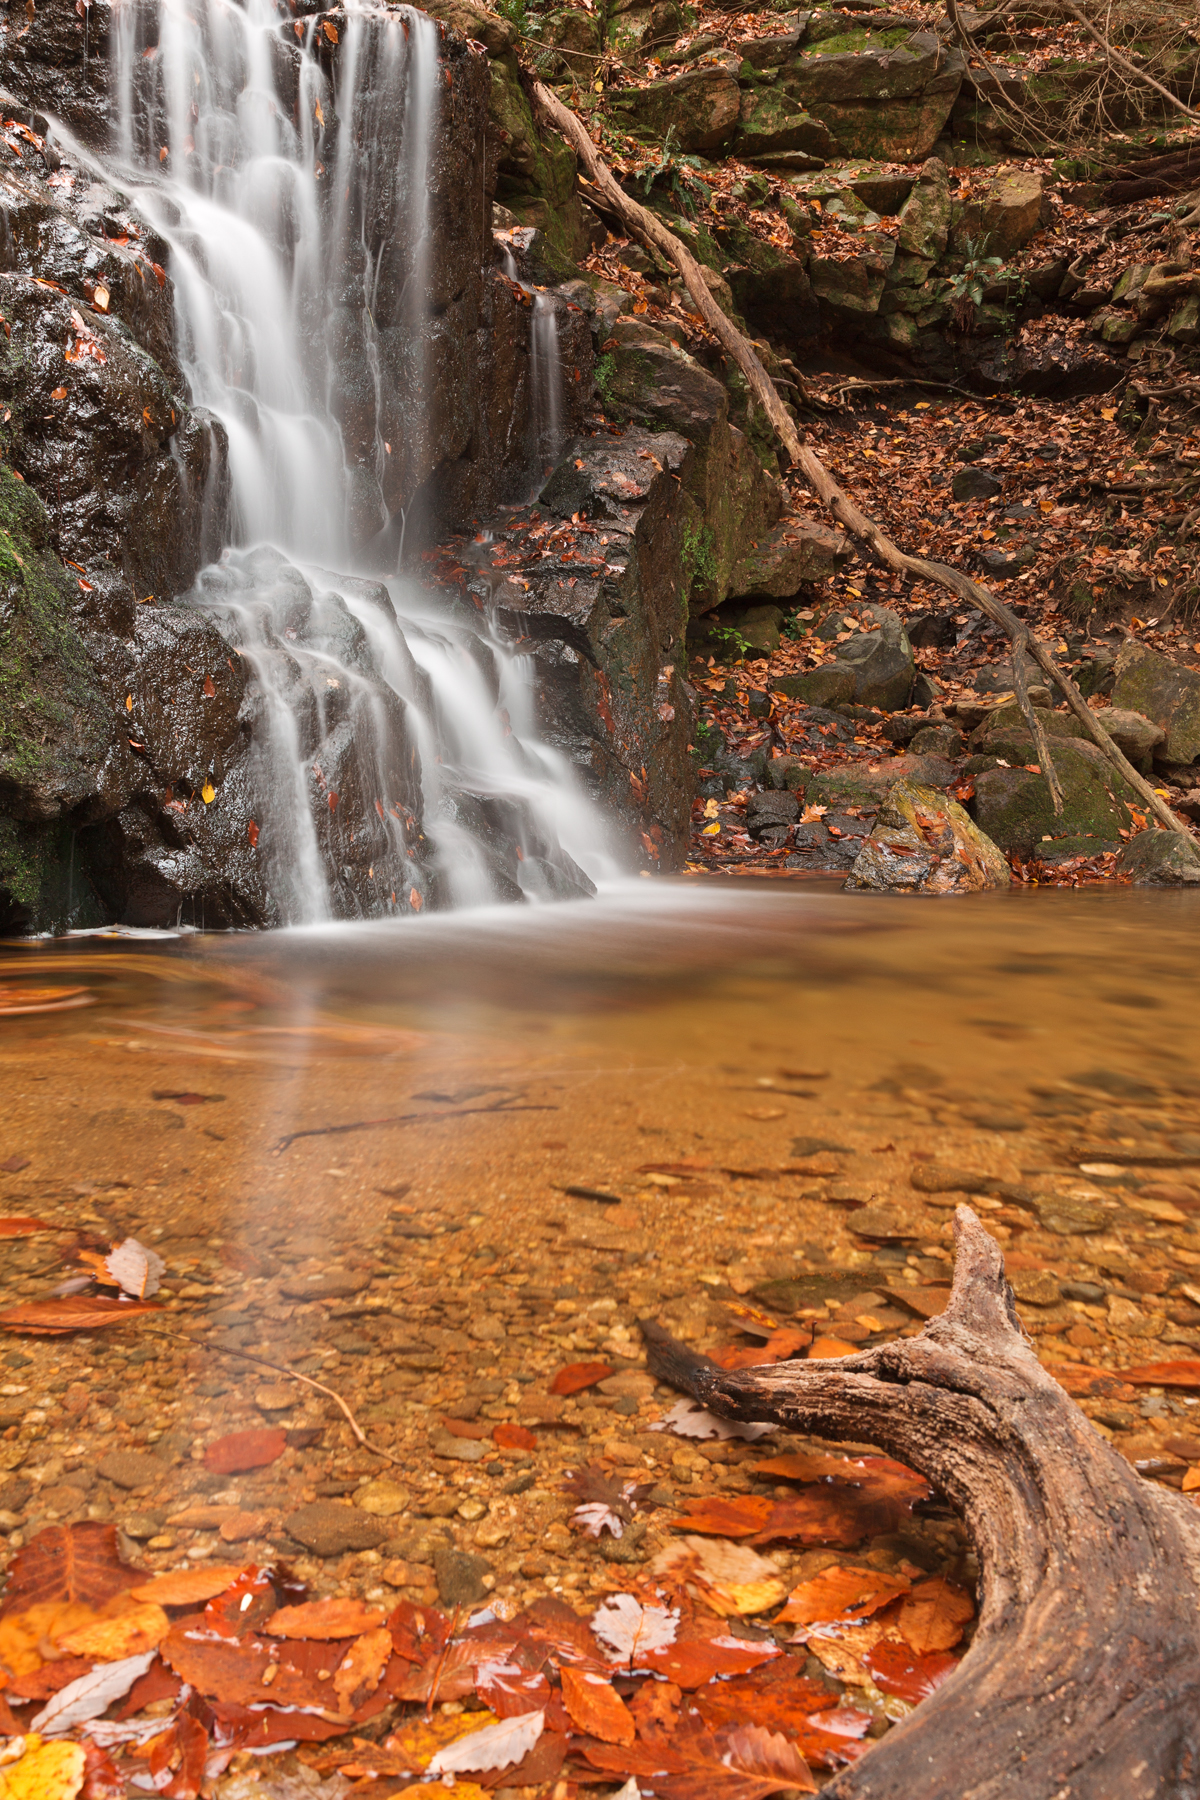 Avalon Hook Falls, America, Pool, Scenic, Scenery, HQ Photo